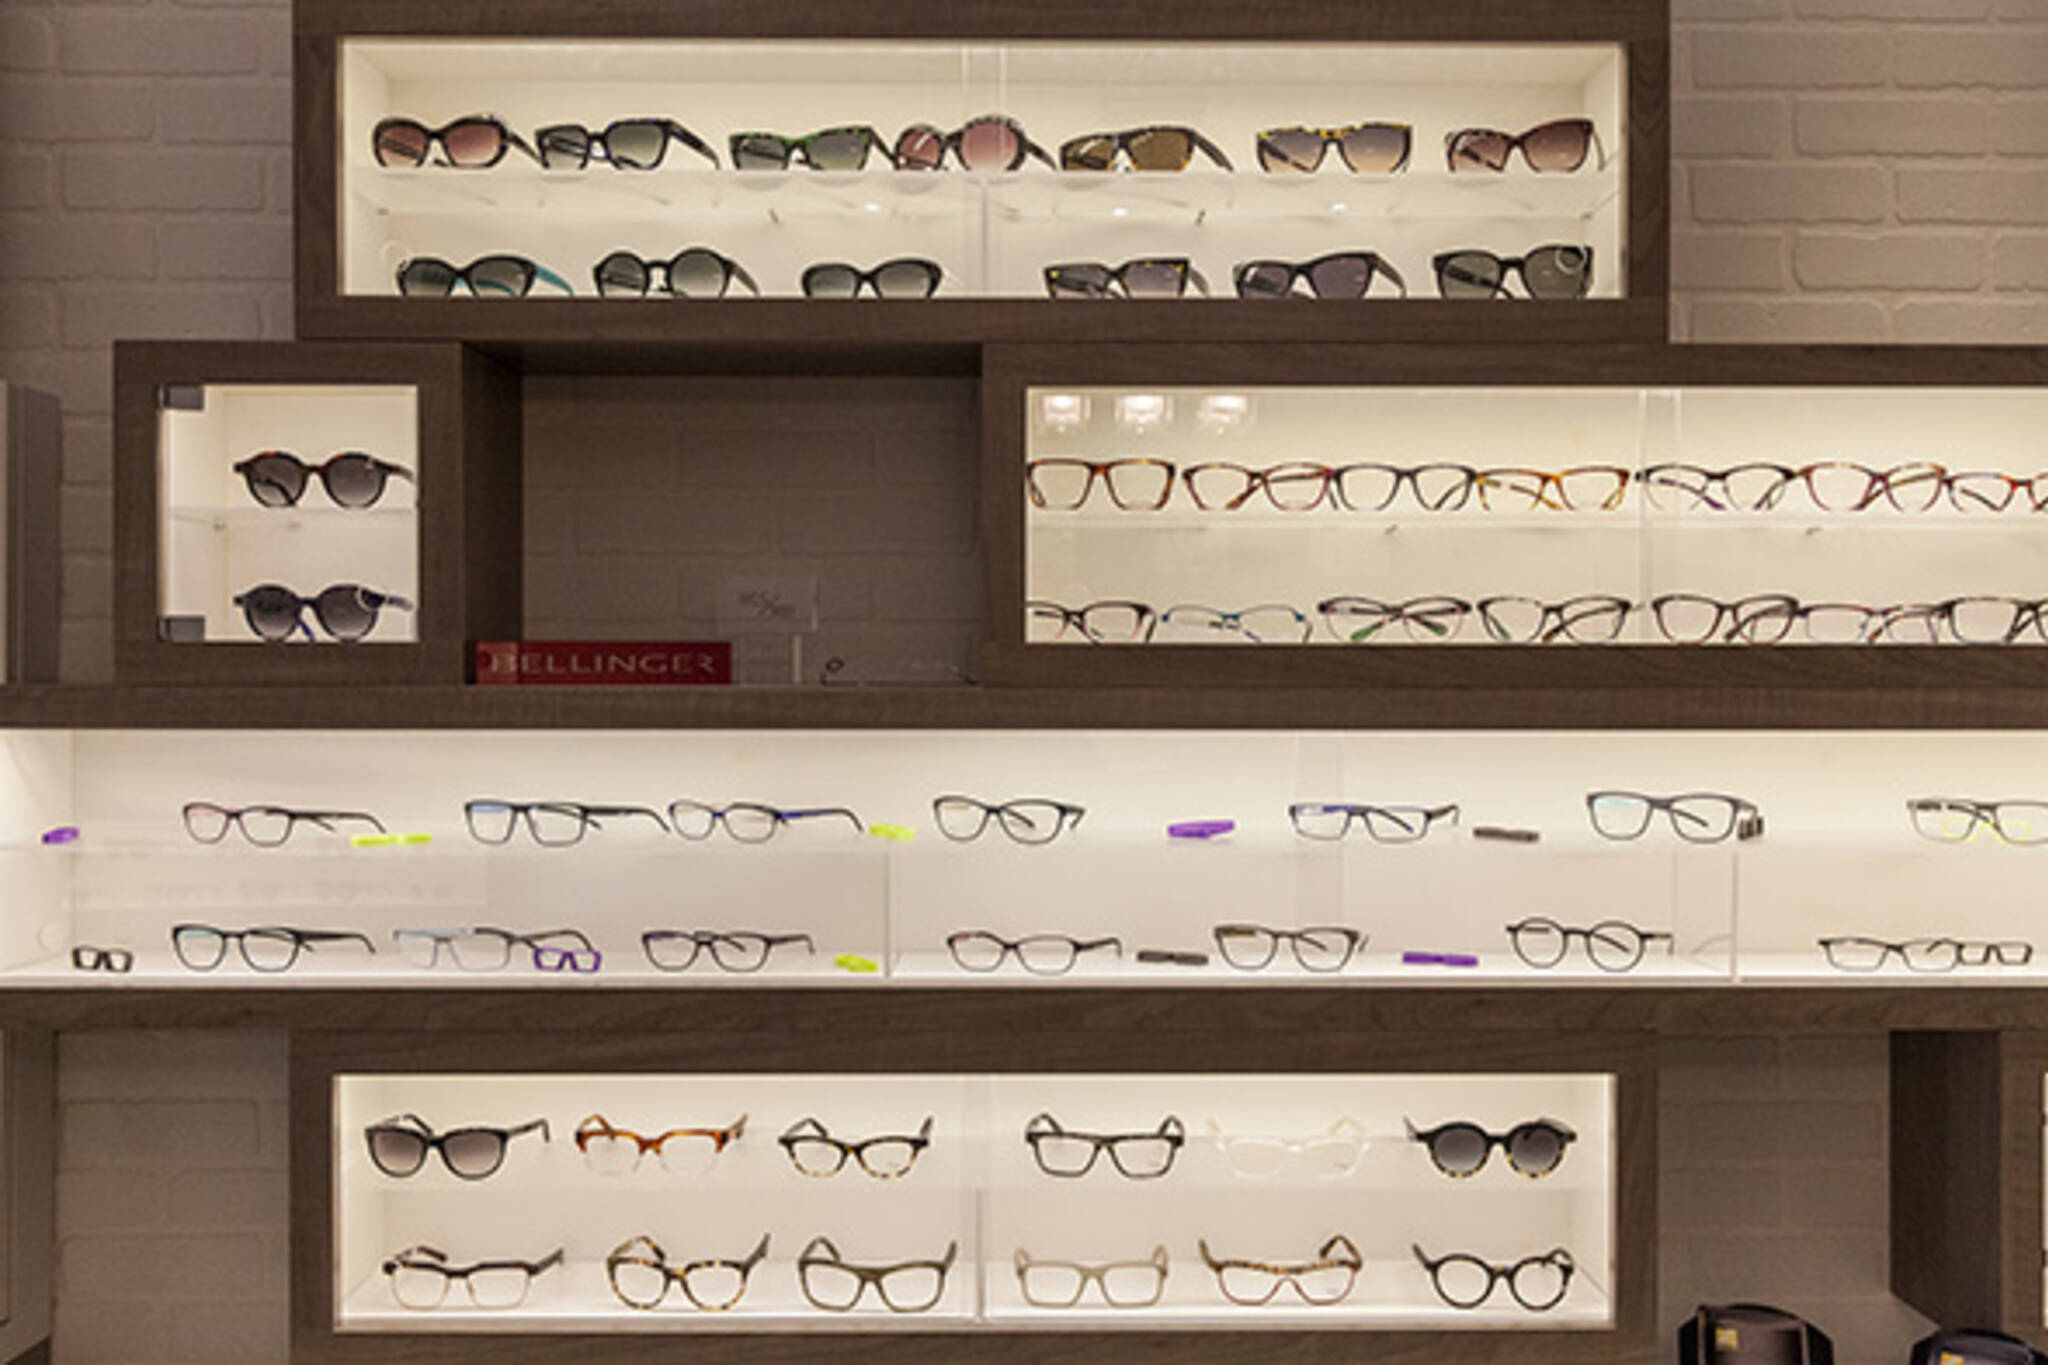 312 Optical Studio